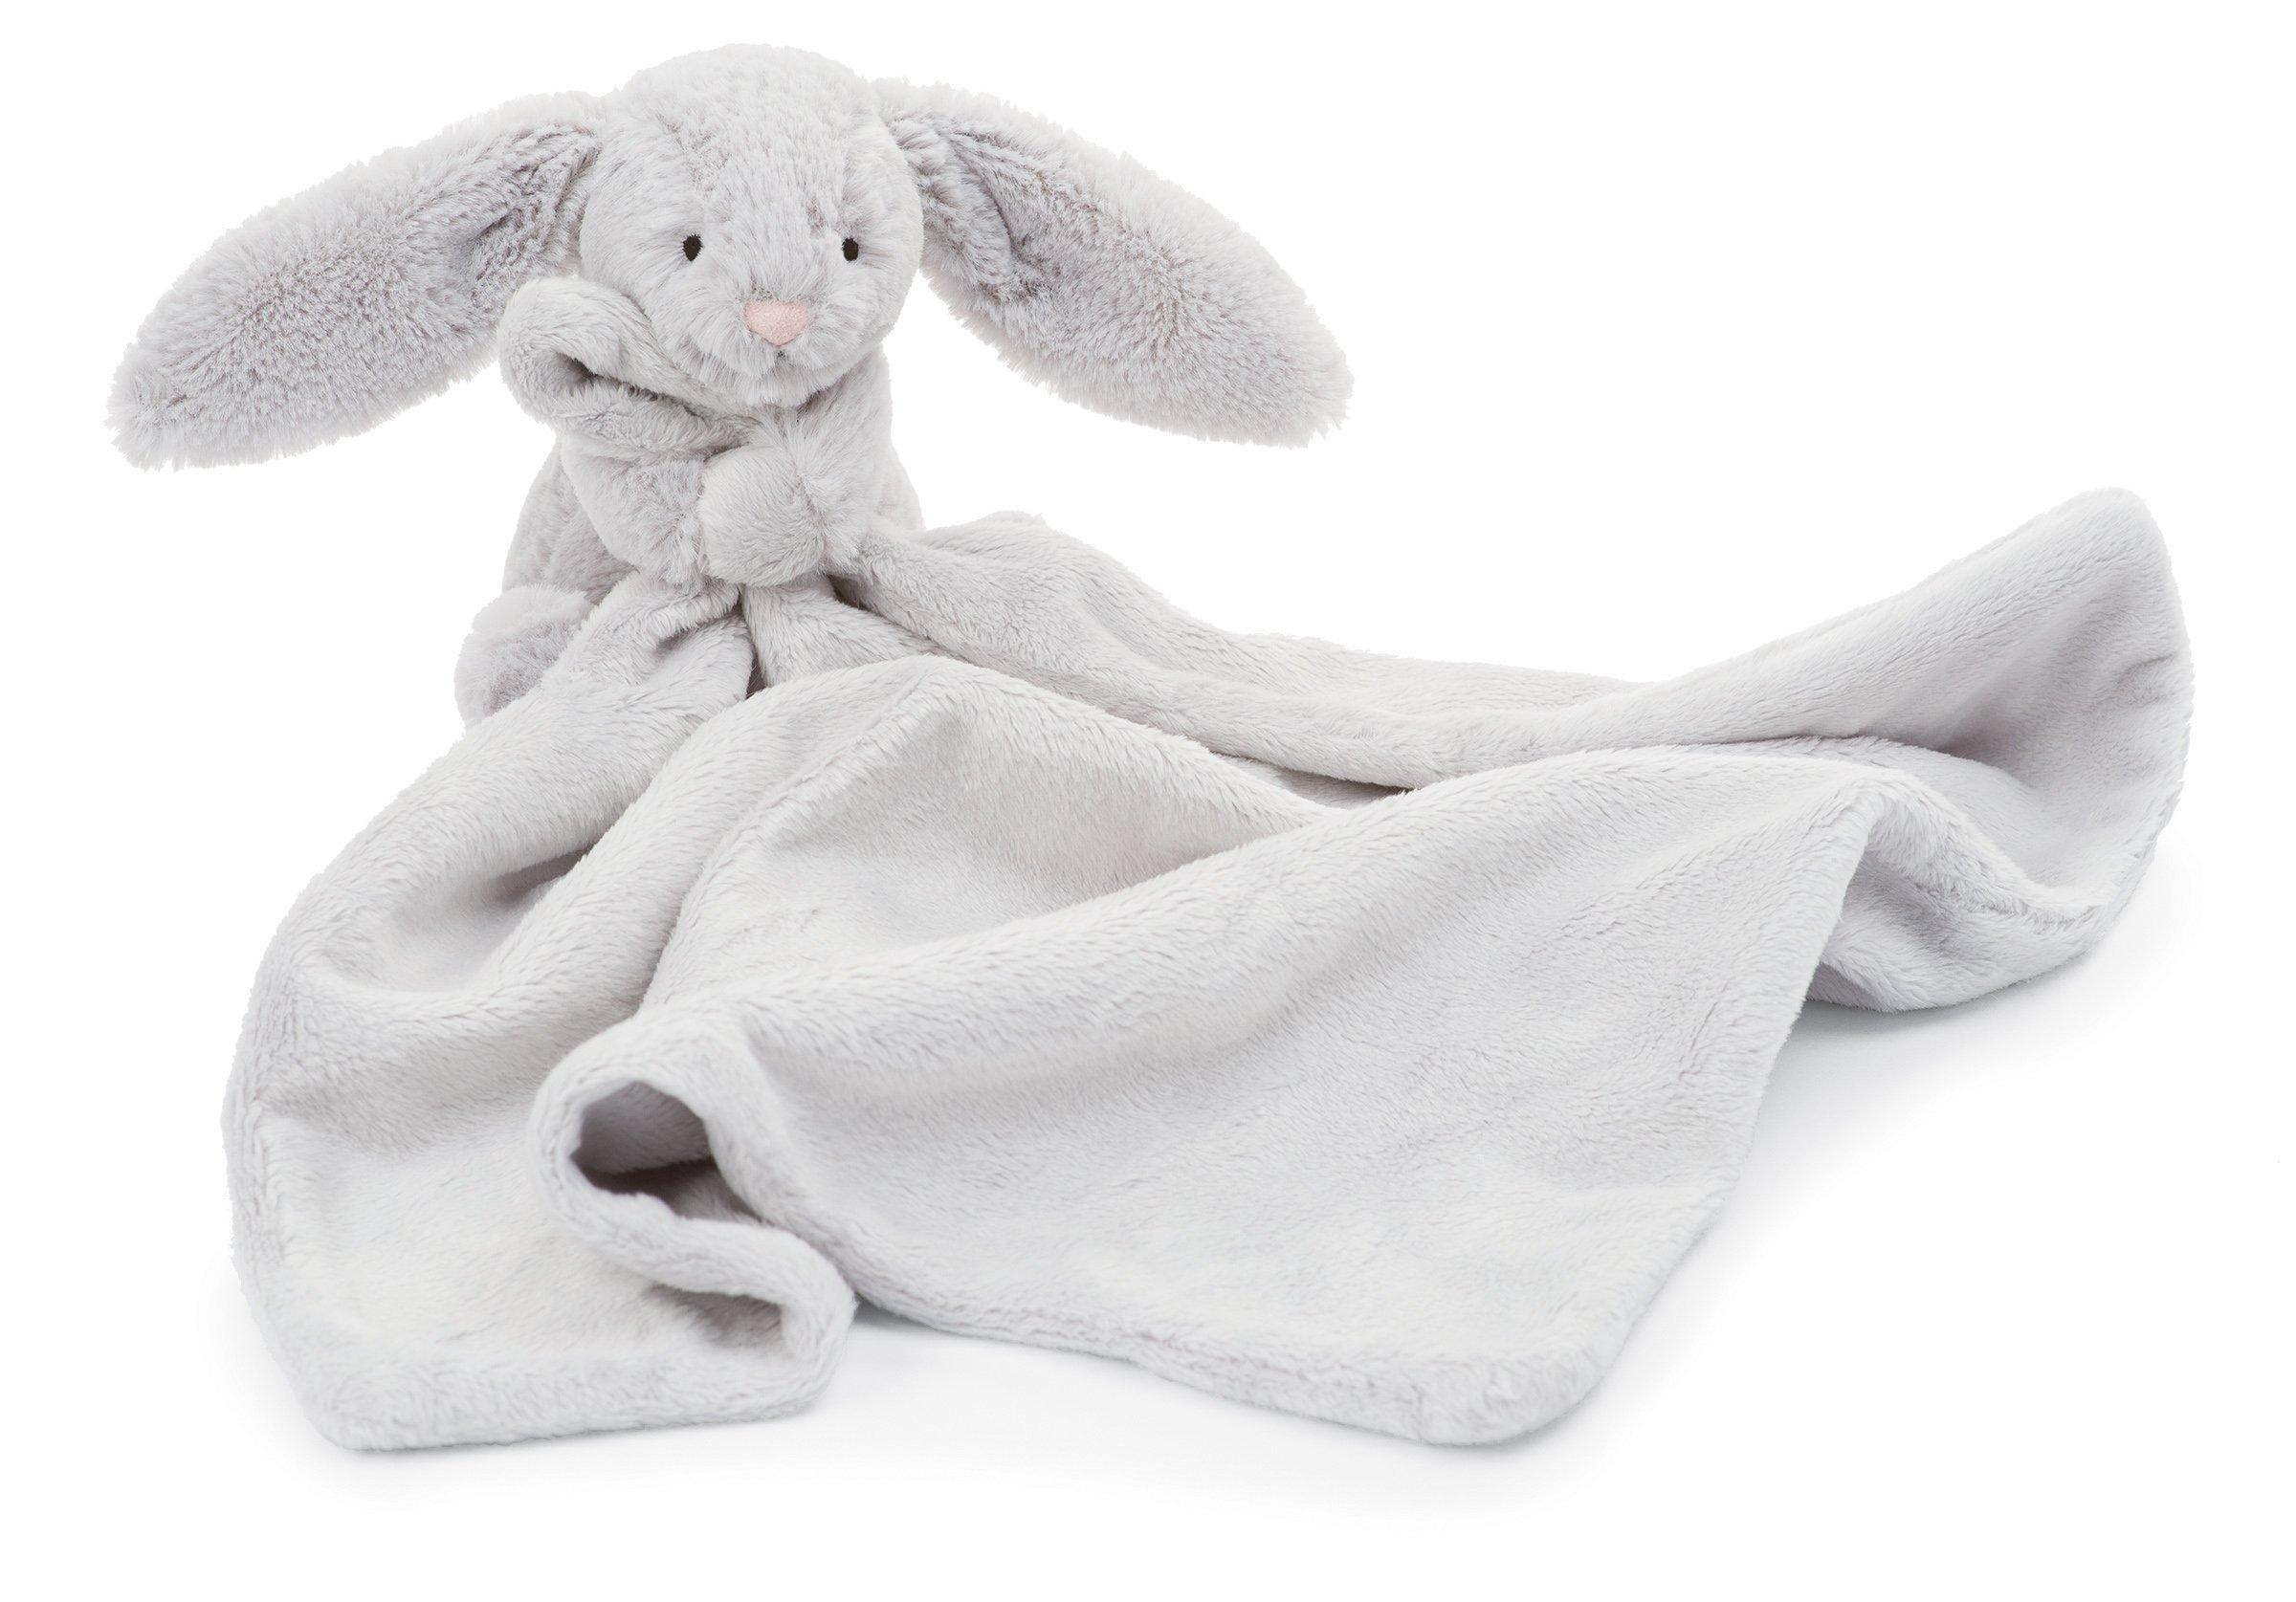 Jellycat Bashful Grey Bunny Baby Security Blanket by Jellycat